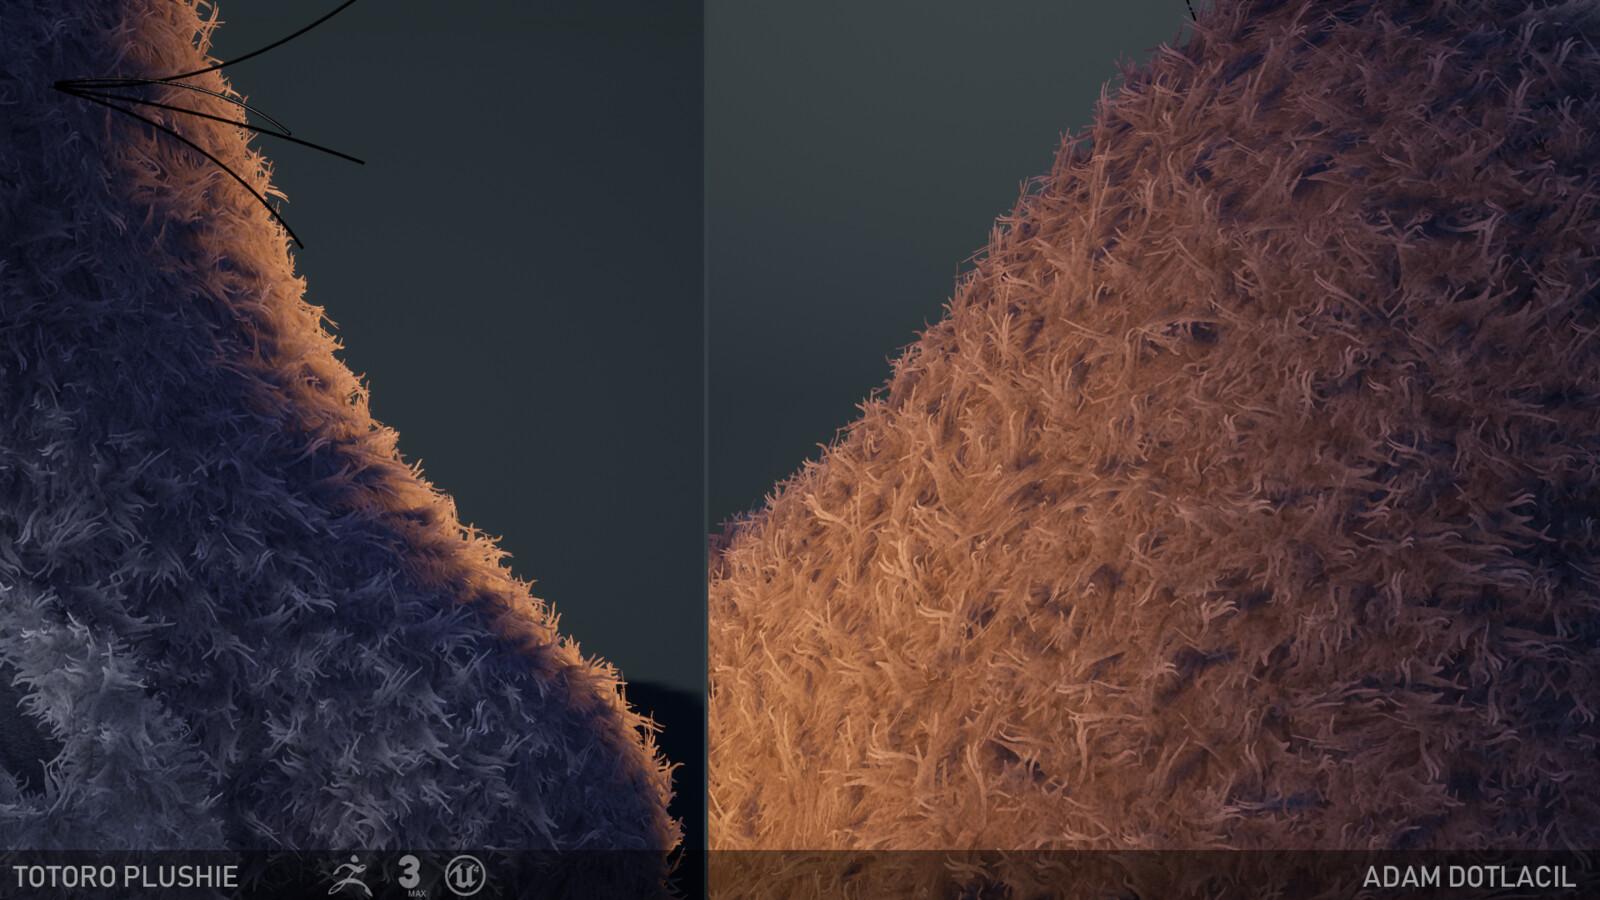 Fur under a rim light & shadow casting